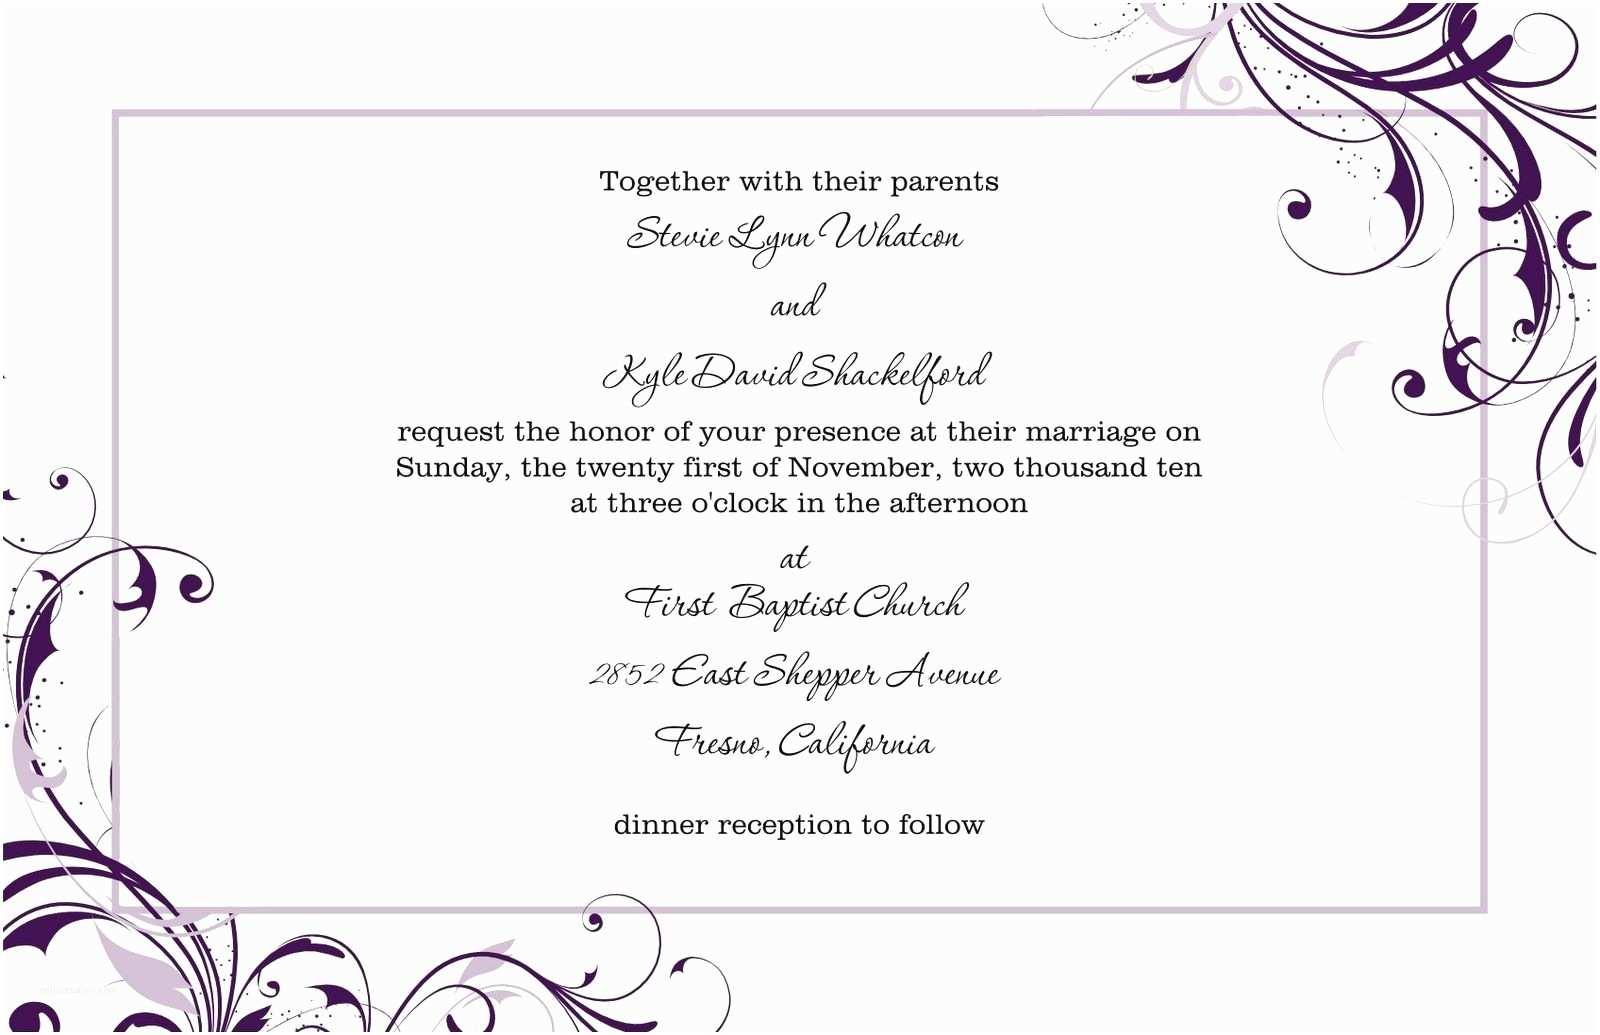 Wedding Invitation Content Free Wedding Invitation Templates For